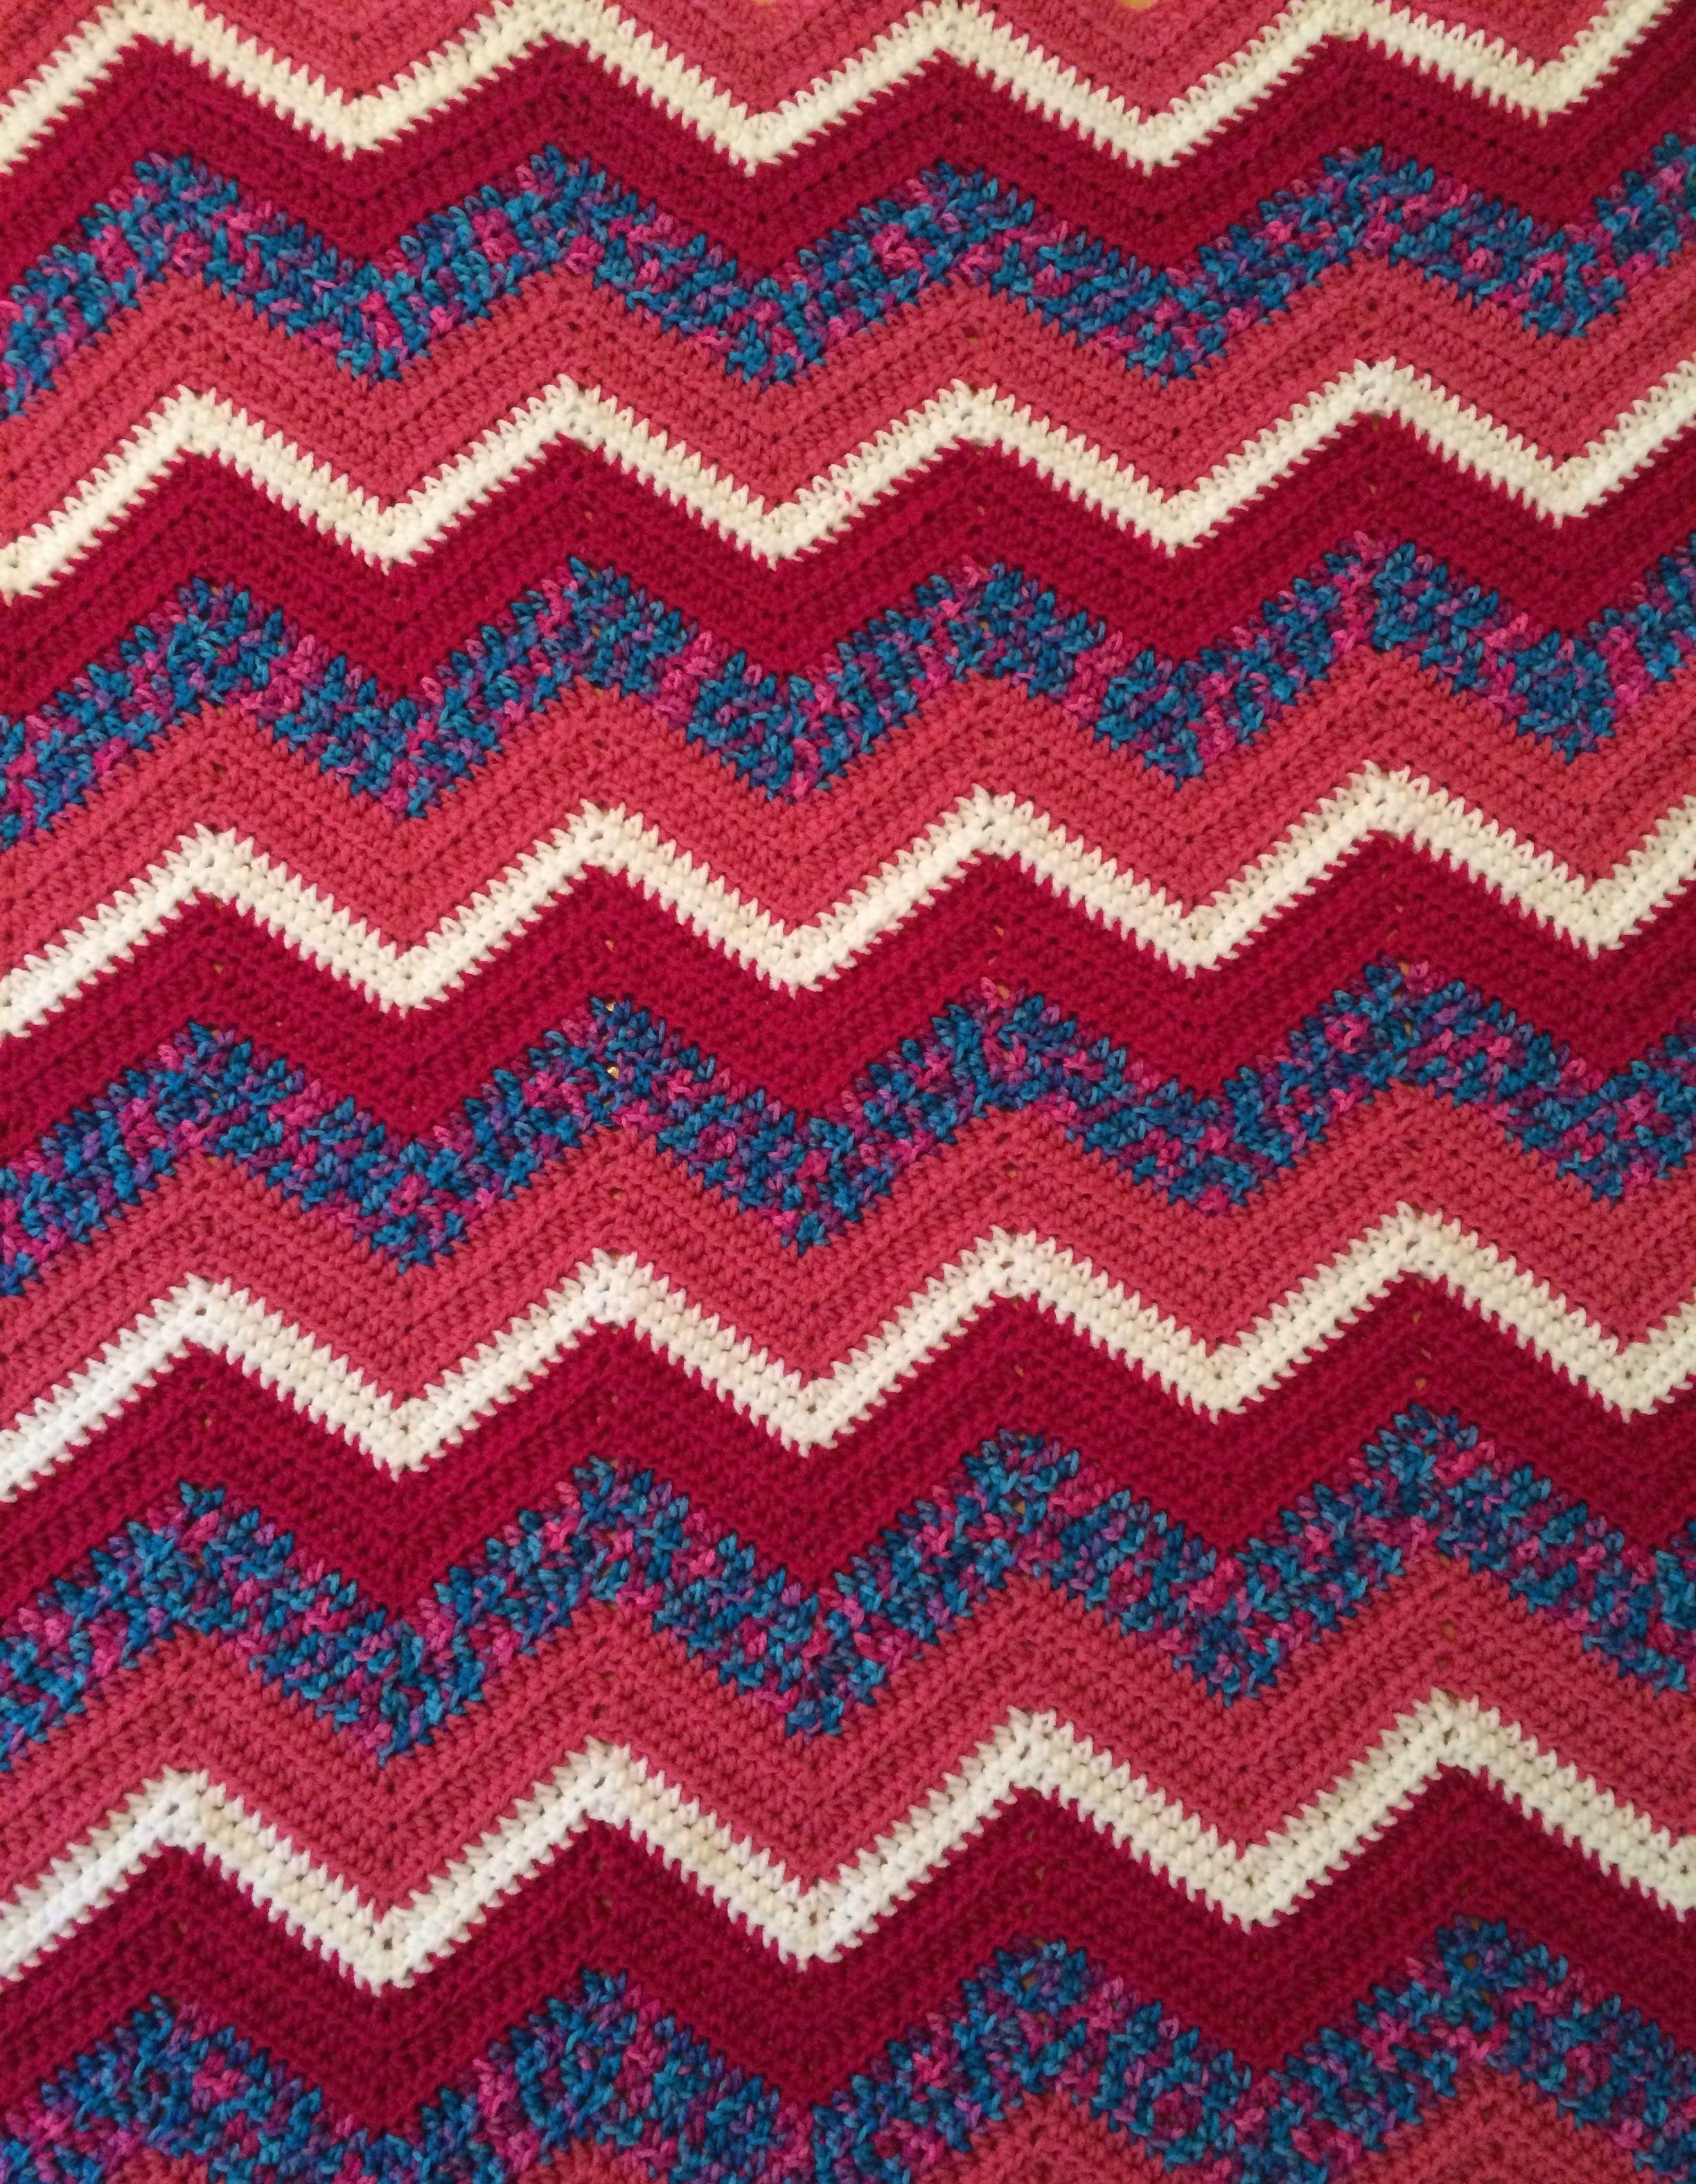 Crocheted ripple baby blanket 30\